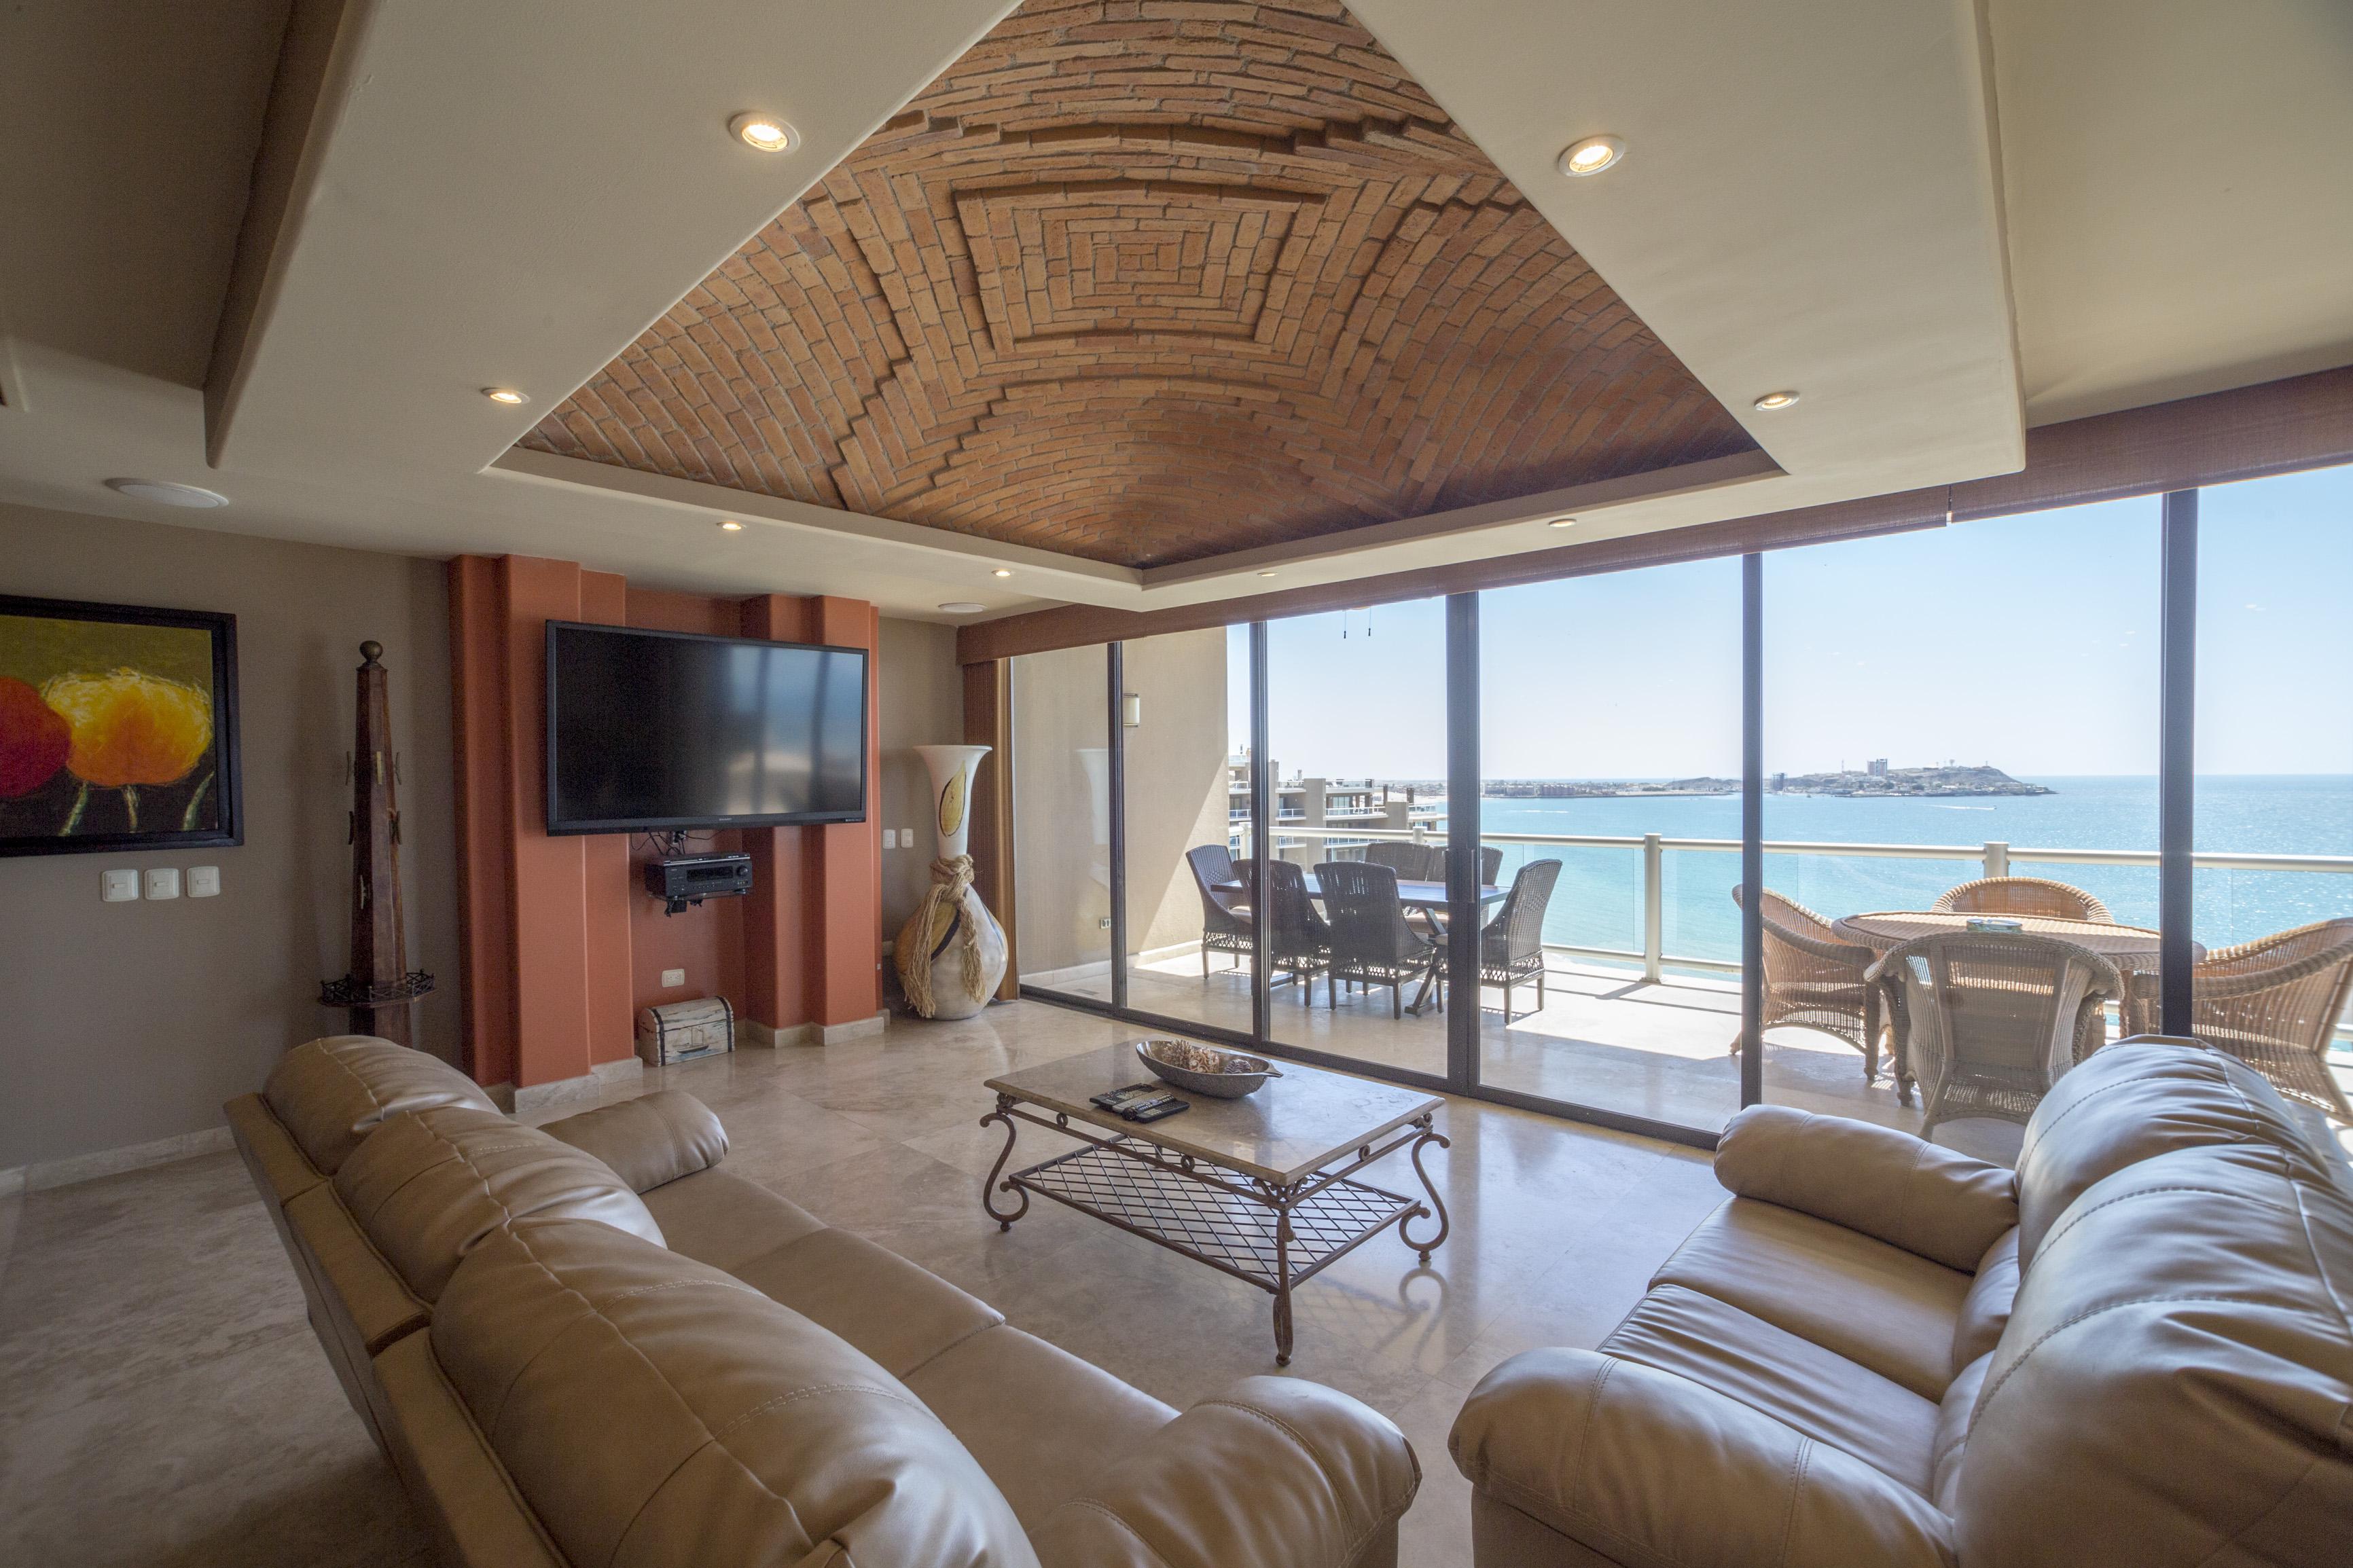 3 Bedroom Penthouse Las Palomas Beach Amp Golf Resort